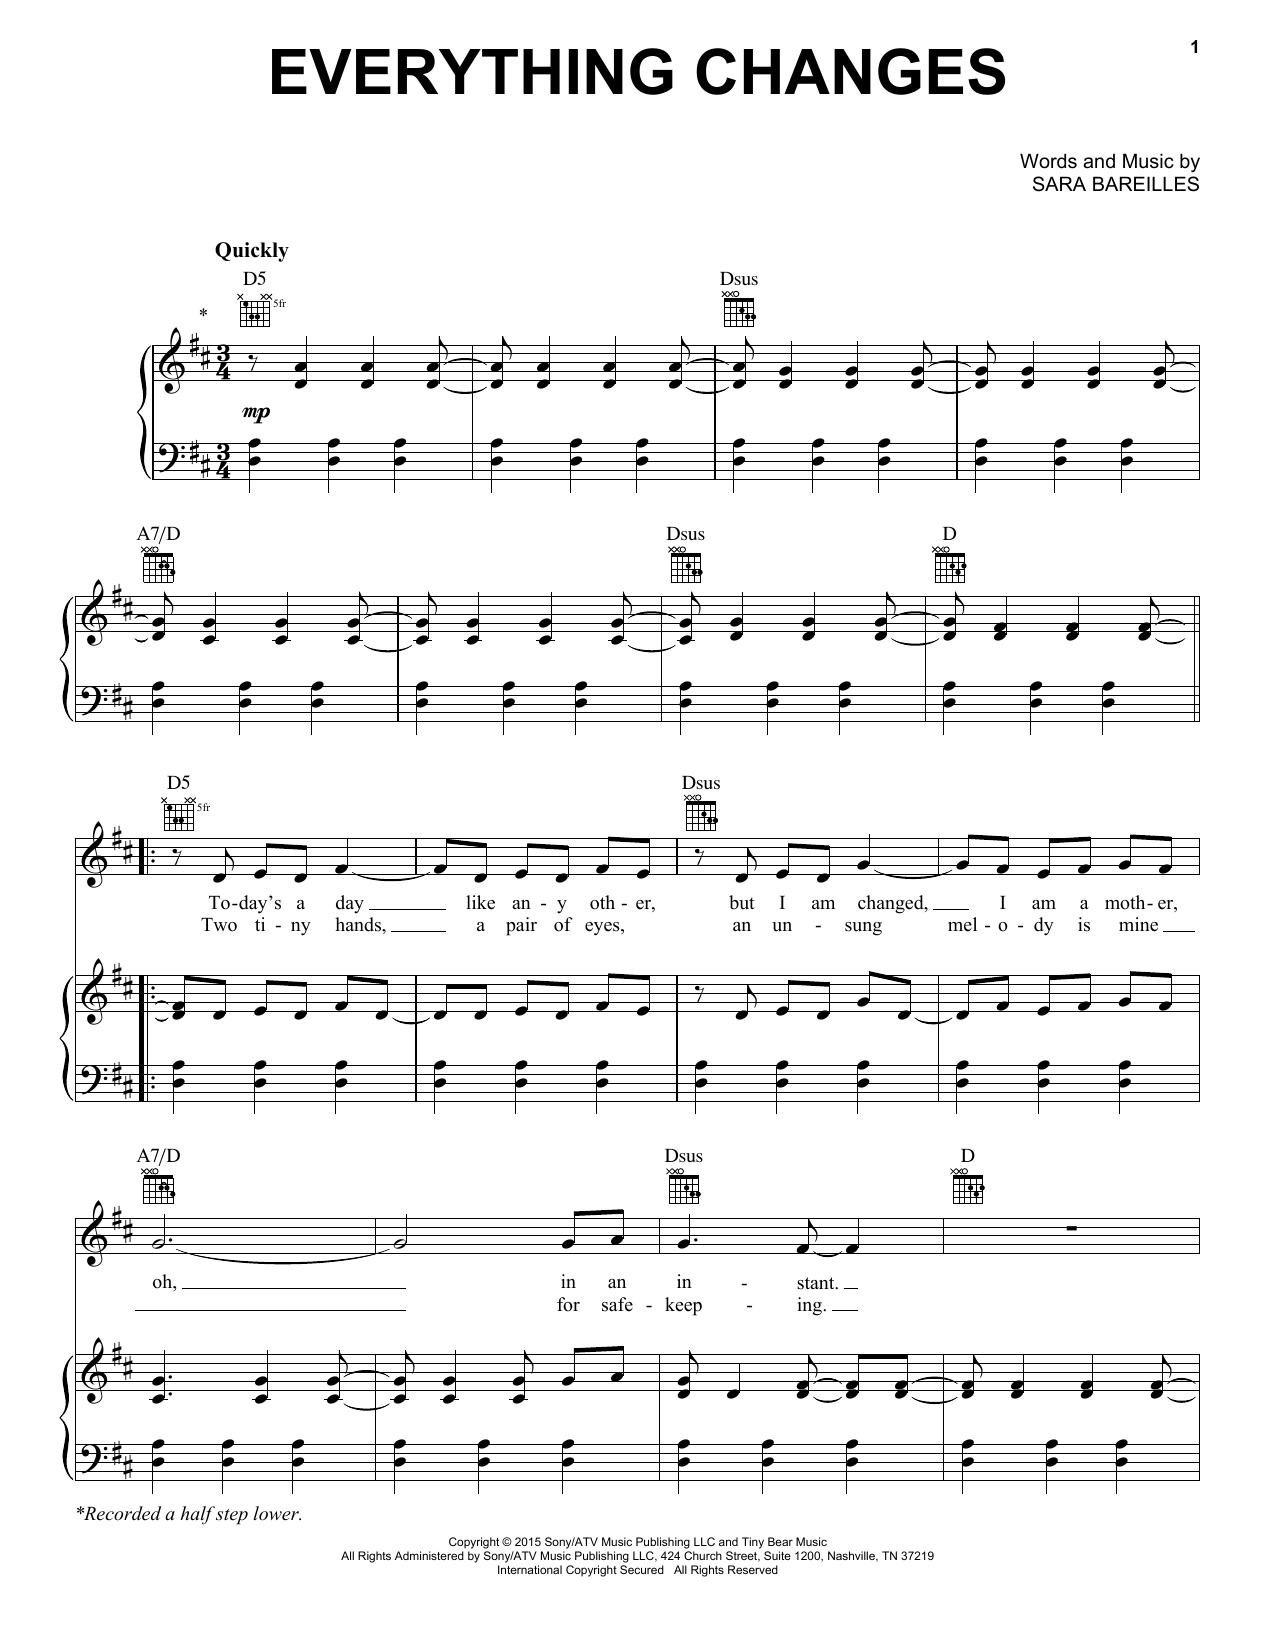 Sheet Music Digital Files To Print Licensed Sara Bareilles Digital